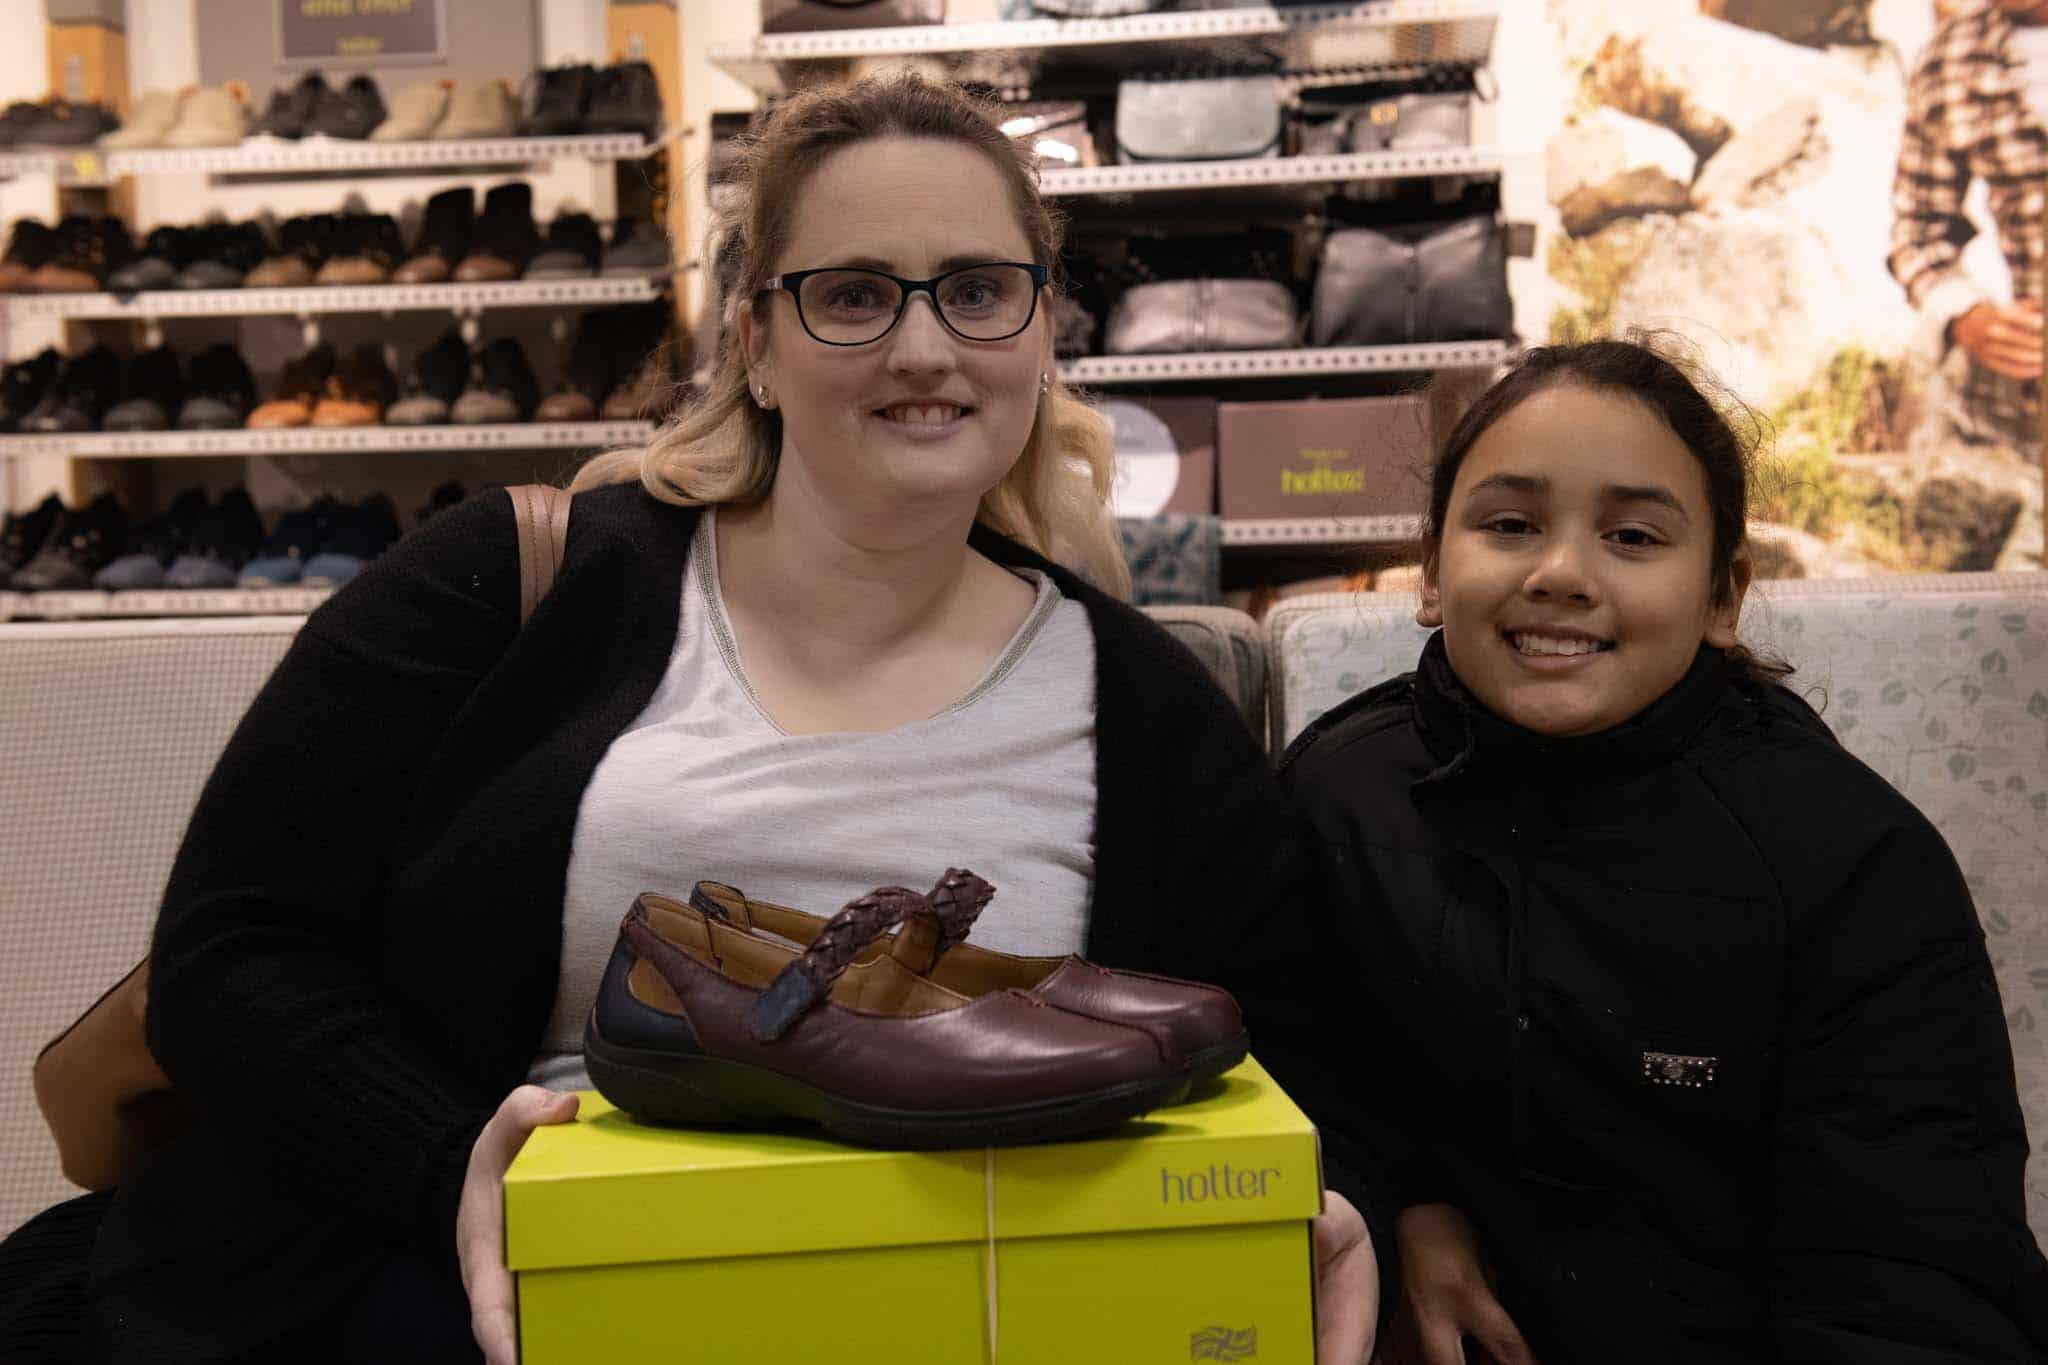 Hotter shoe shop at affinity lancashire